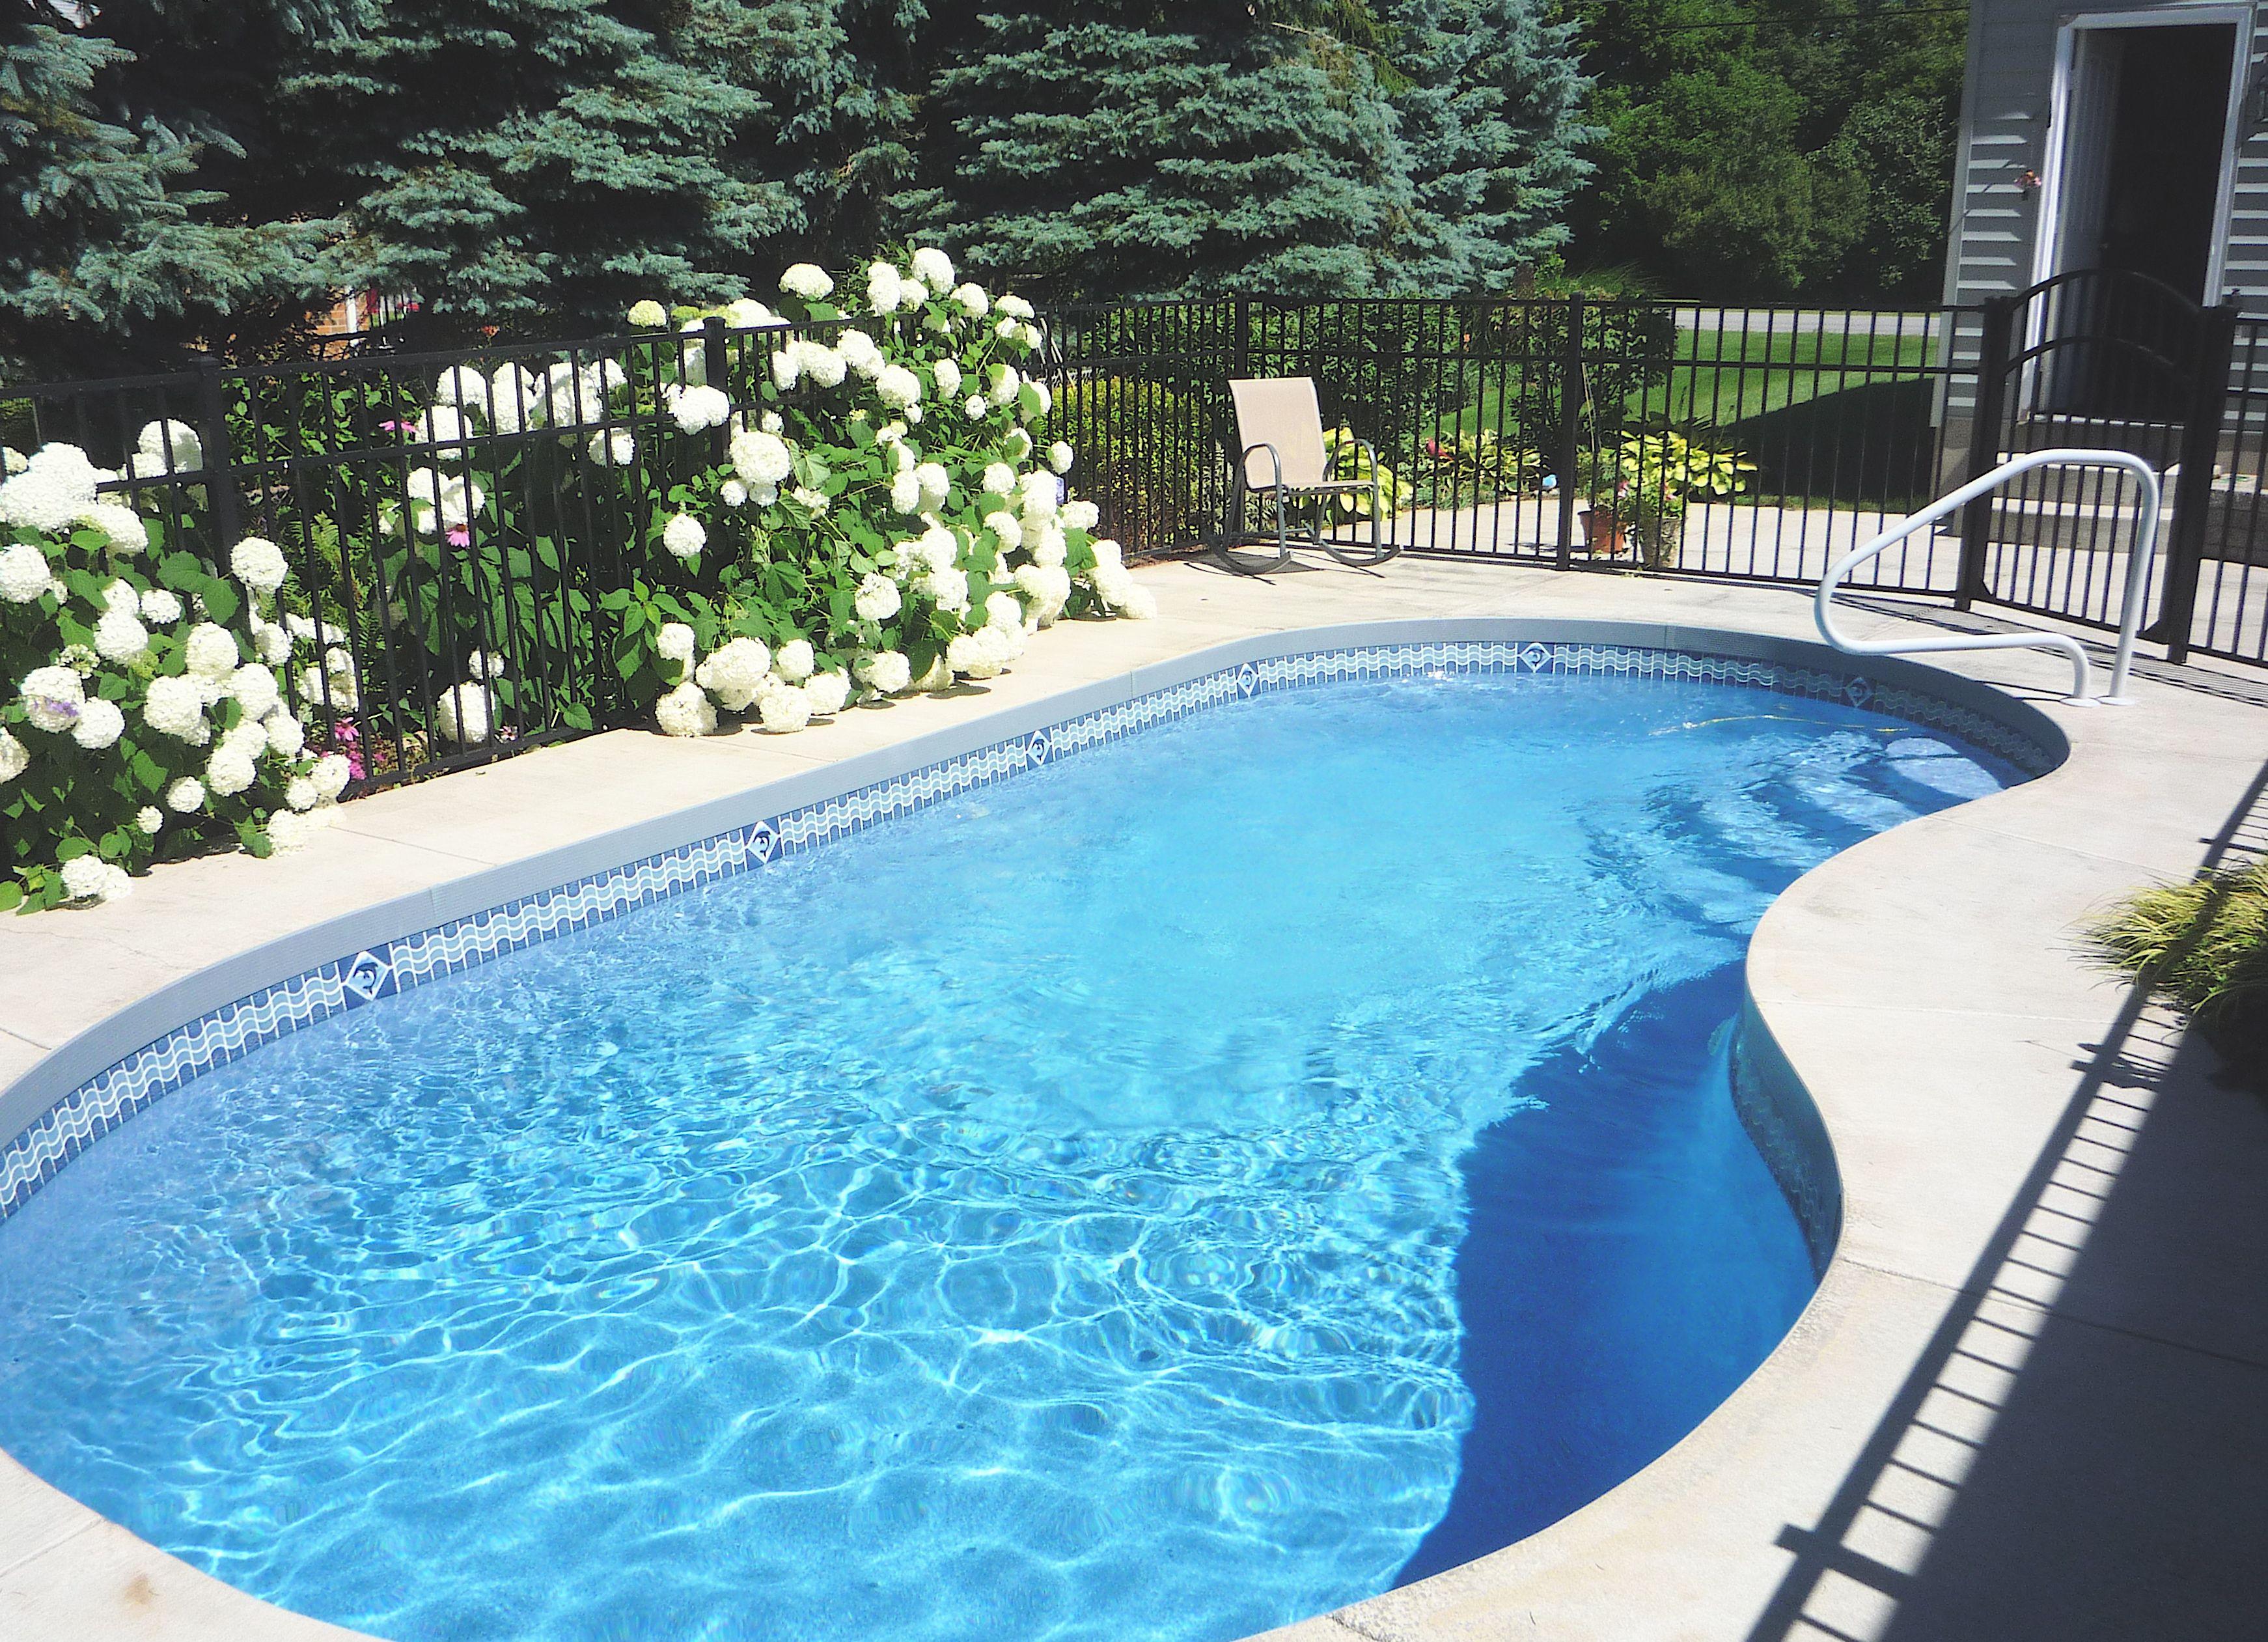 Viking 12 X 24 Suncoast Inground Pool Located In Akron Ny Pool Viking Pools Inground Pools